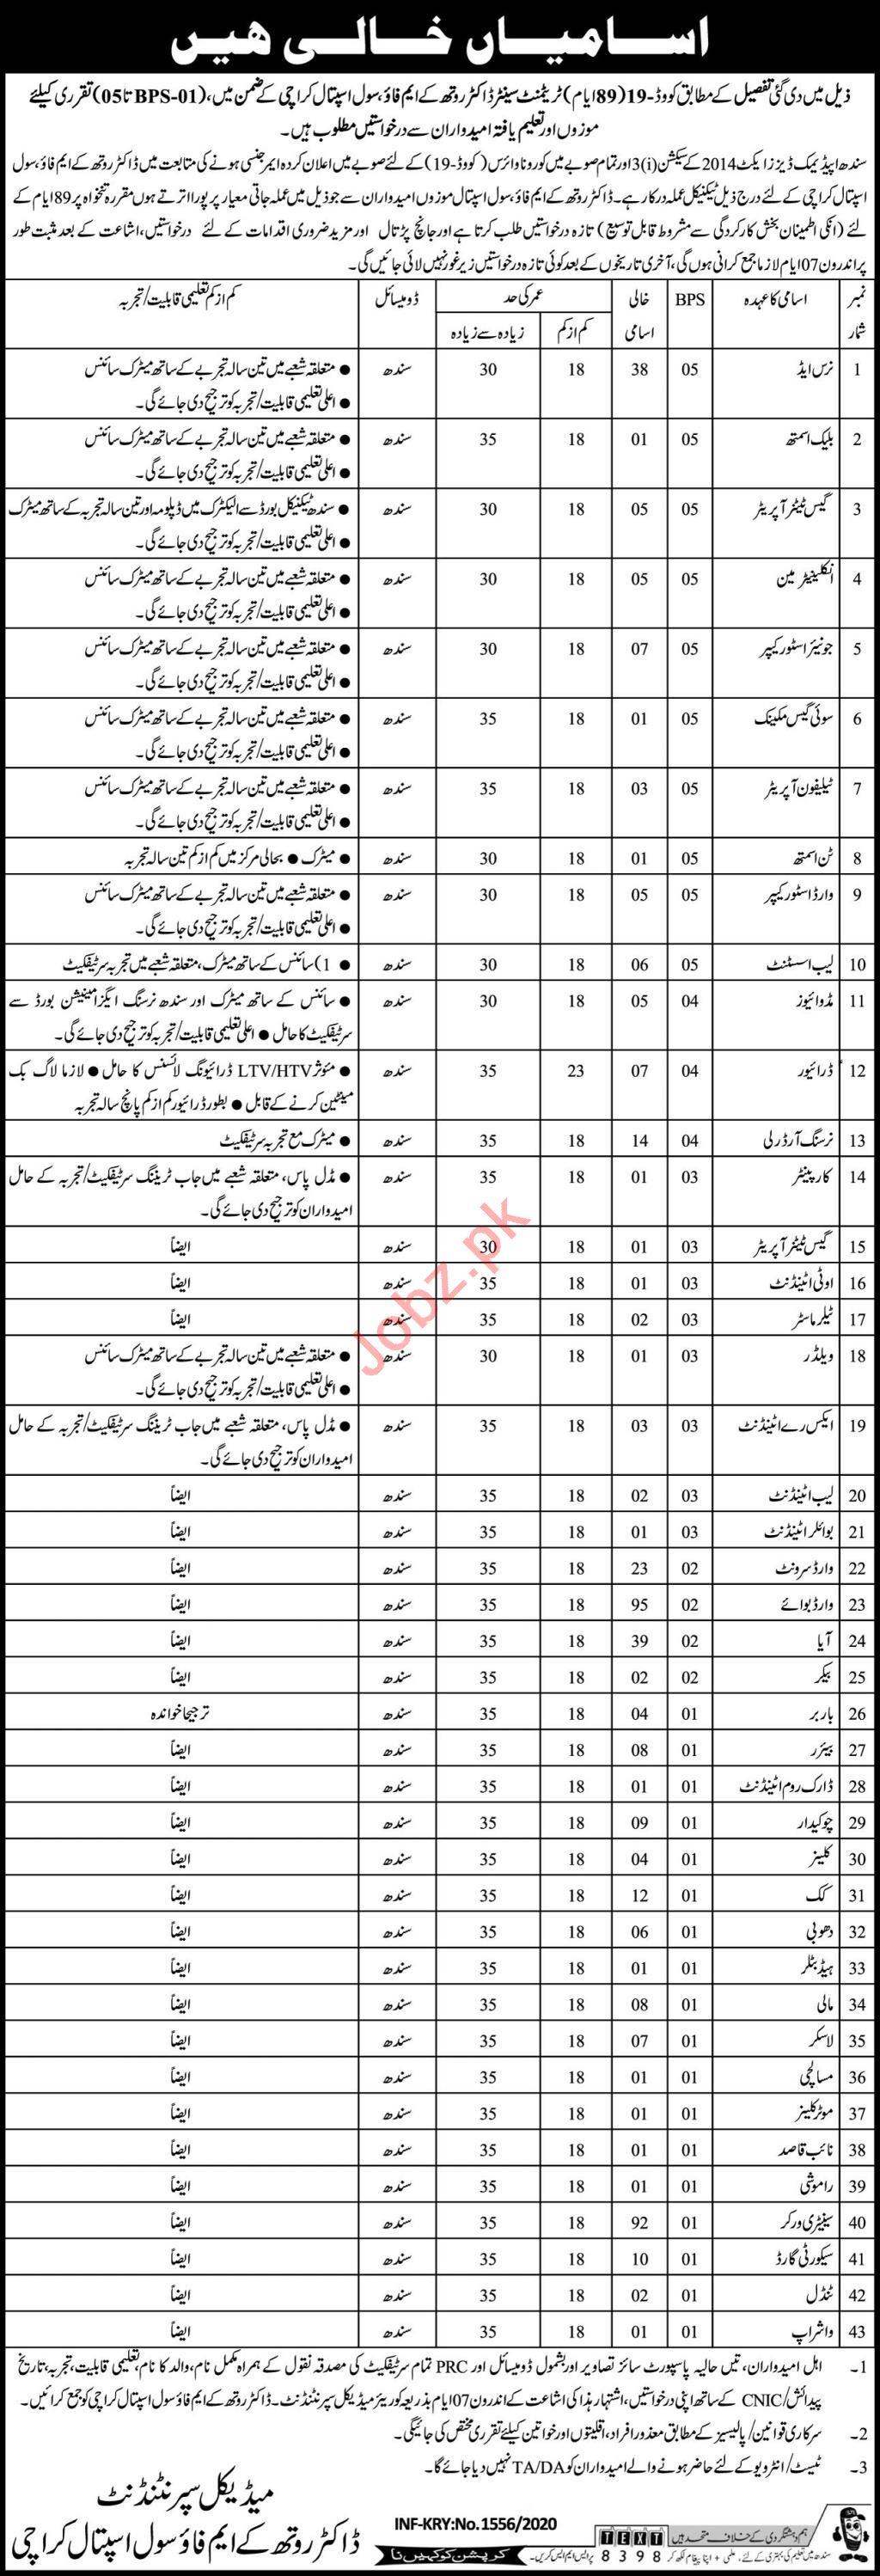 Dr Ruth Pfau Civil Hospital Karachi Medical Staff Jobs 2020